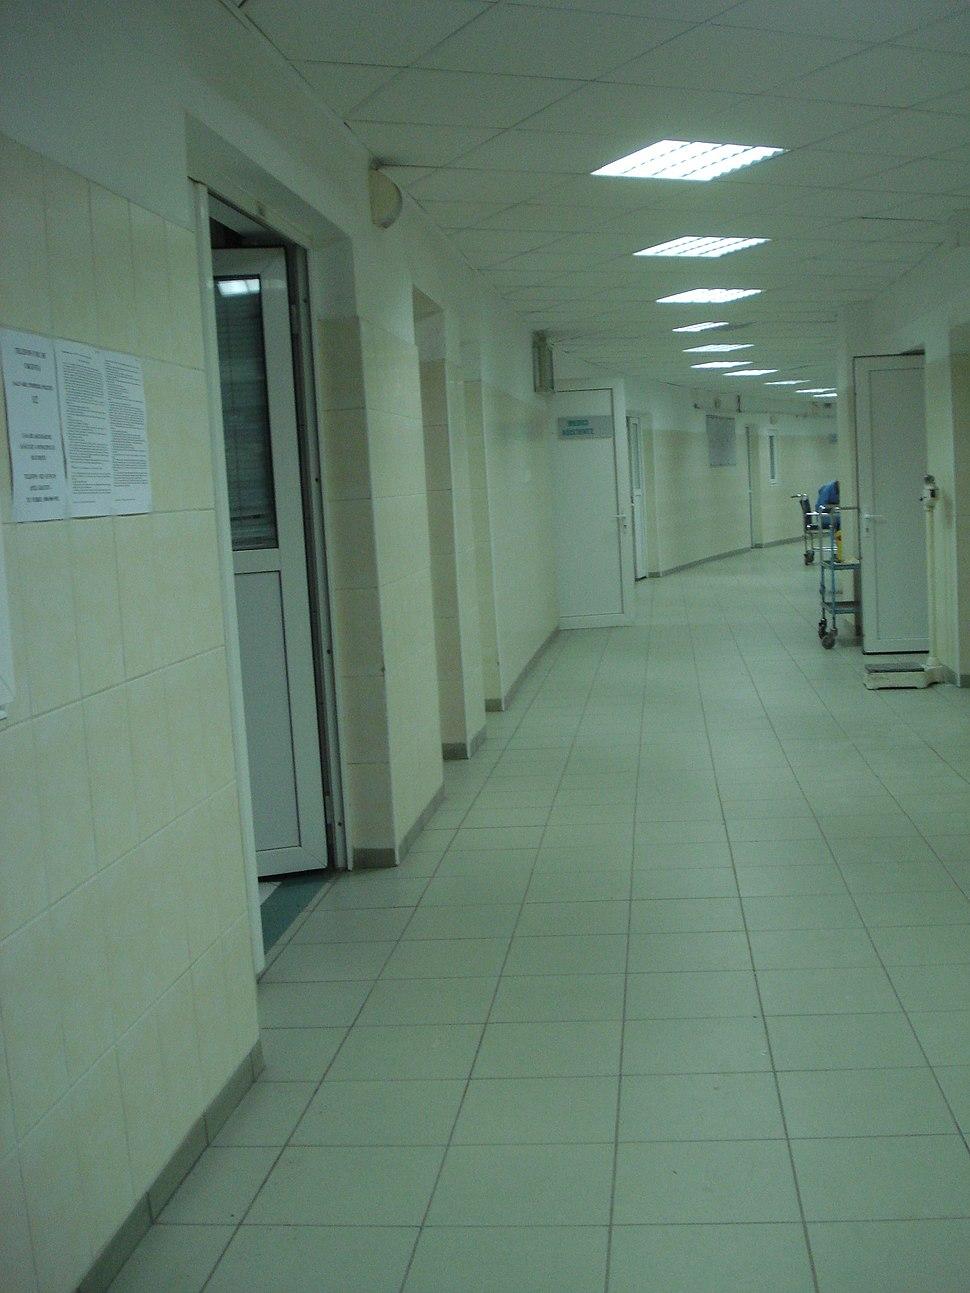 Spitalul de Urgenta Floreasca interior